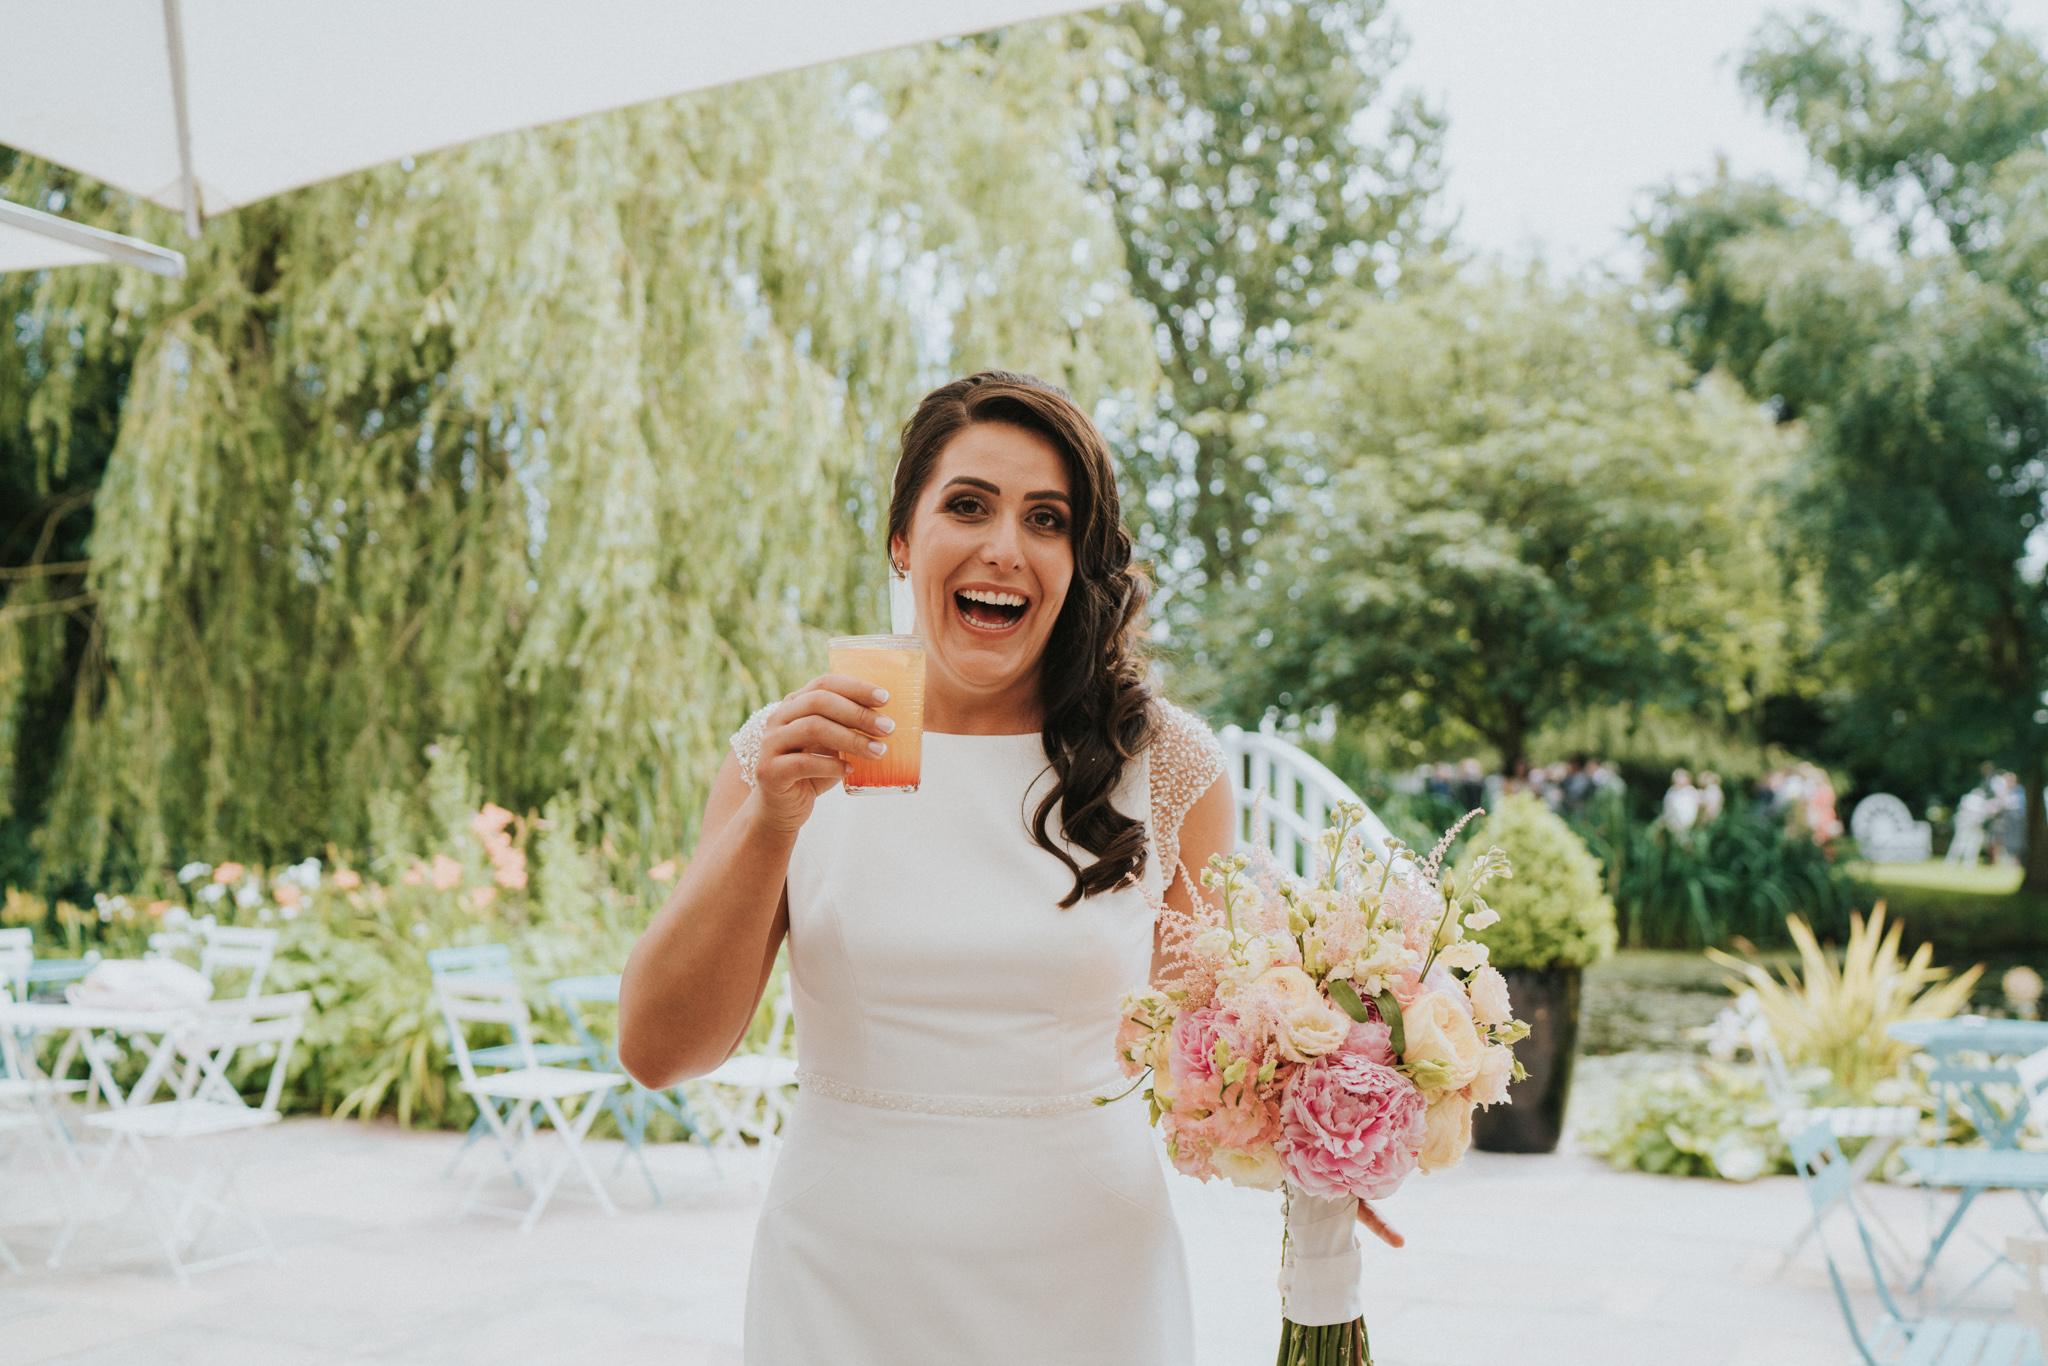 danielle-and-gareths-boho-wedding-previews-at-high-house-weddings-grace-elizabeth-colchester-essex-suffolk-norfolk-devon-alternative-wedding-and-lifestyle-photographer (33 of 76).jpg